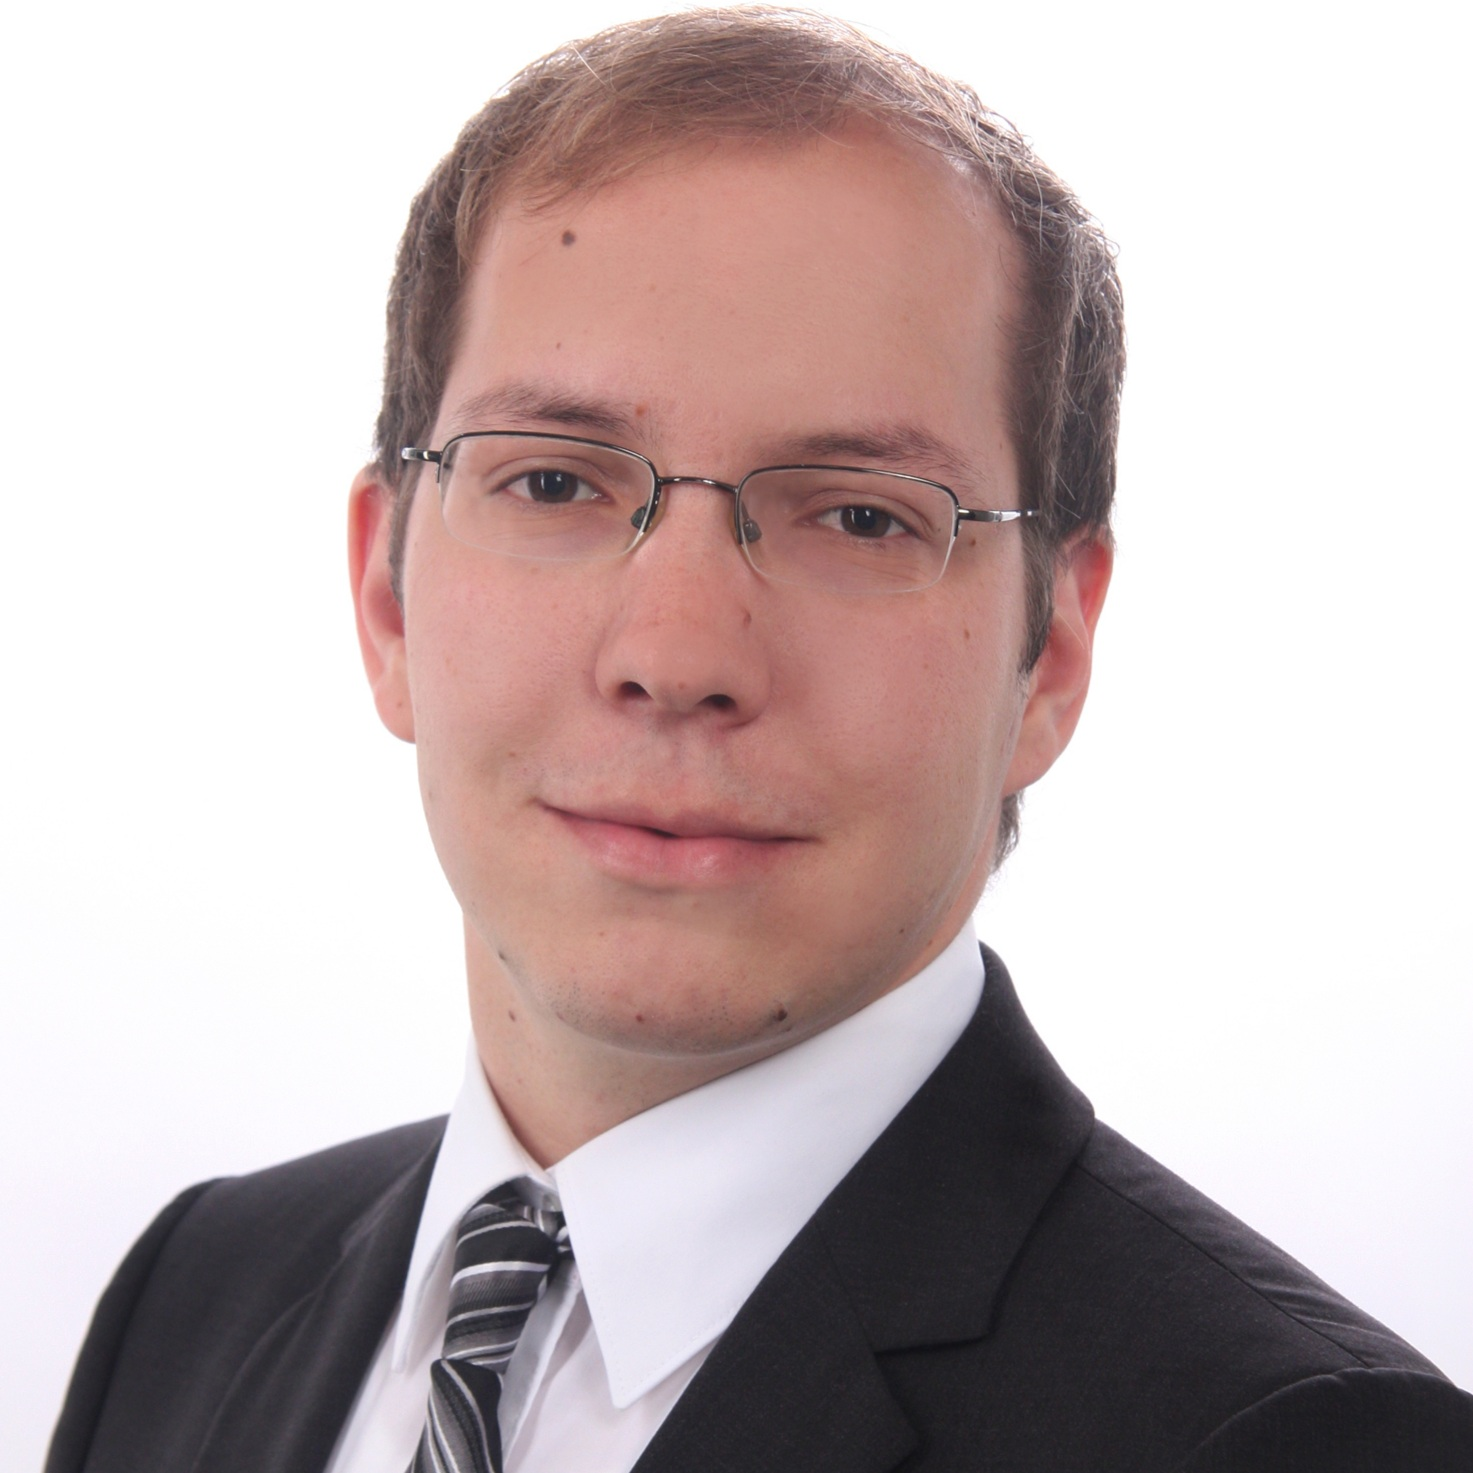 Michael Arbeiter   Senior Consultant  Financial Engineering   LinkedIn  |  Xing